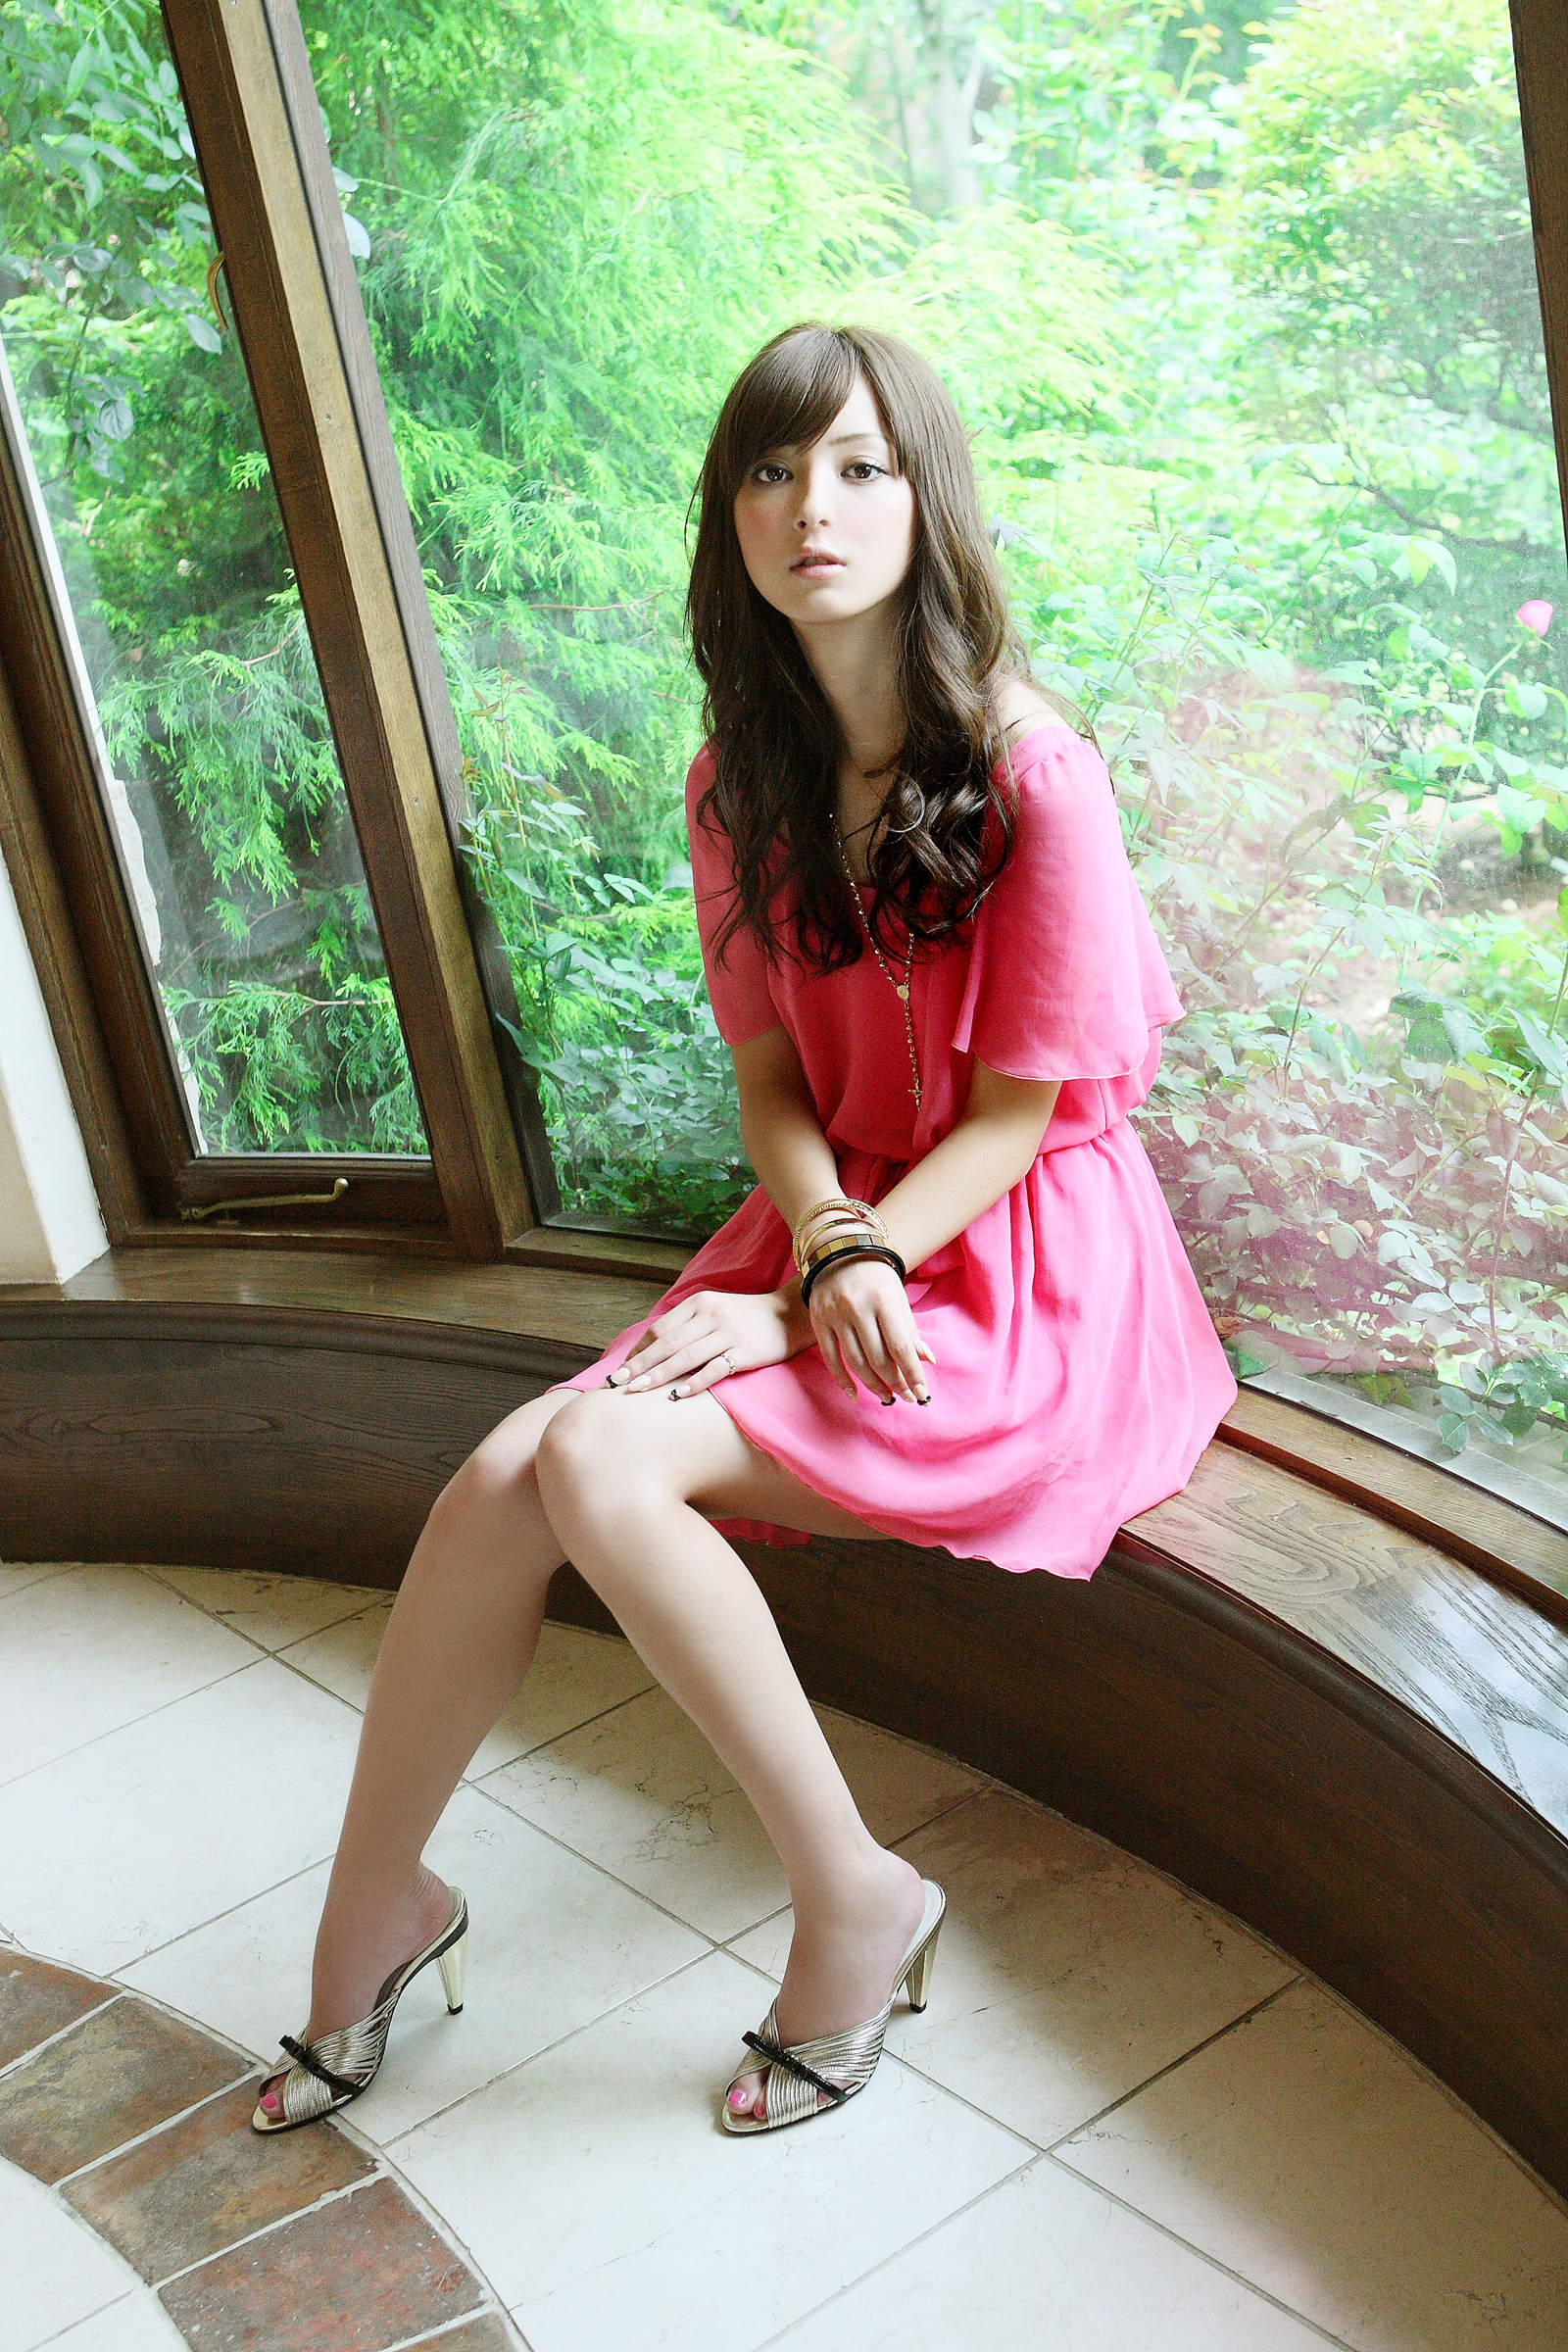 Nozomi Sasaki photo 5 of 46 pics, wallpaper - photo ...